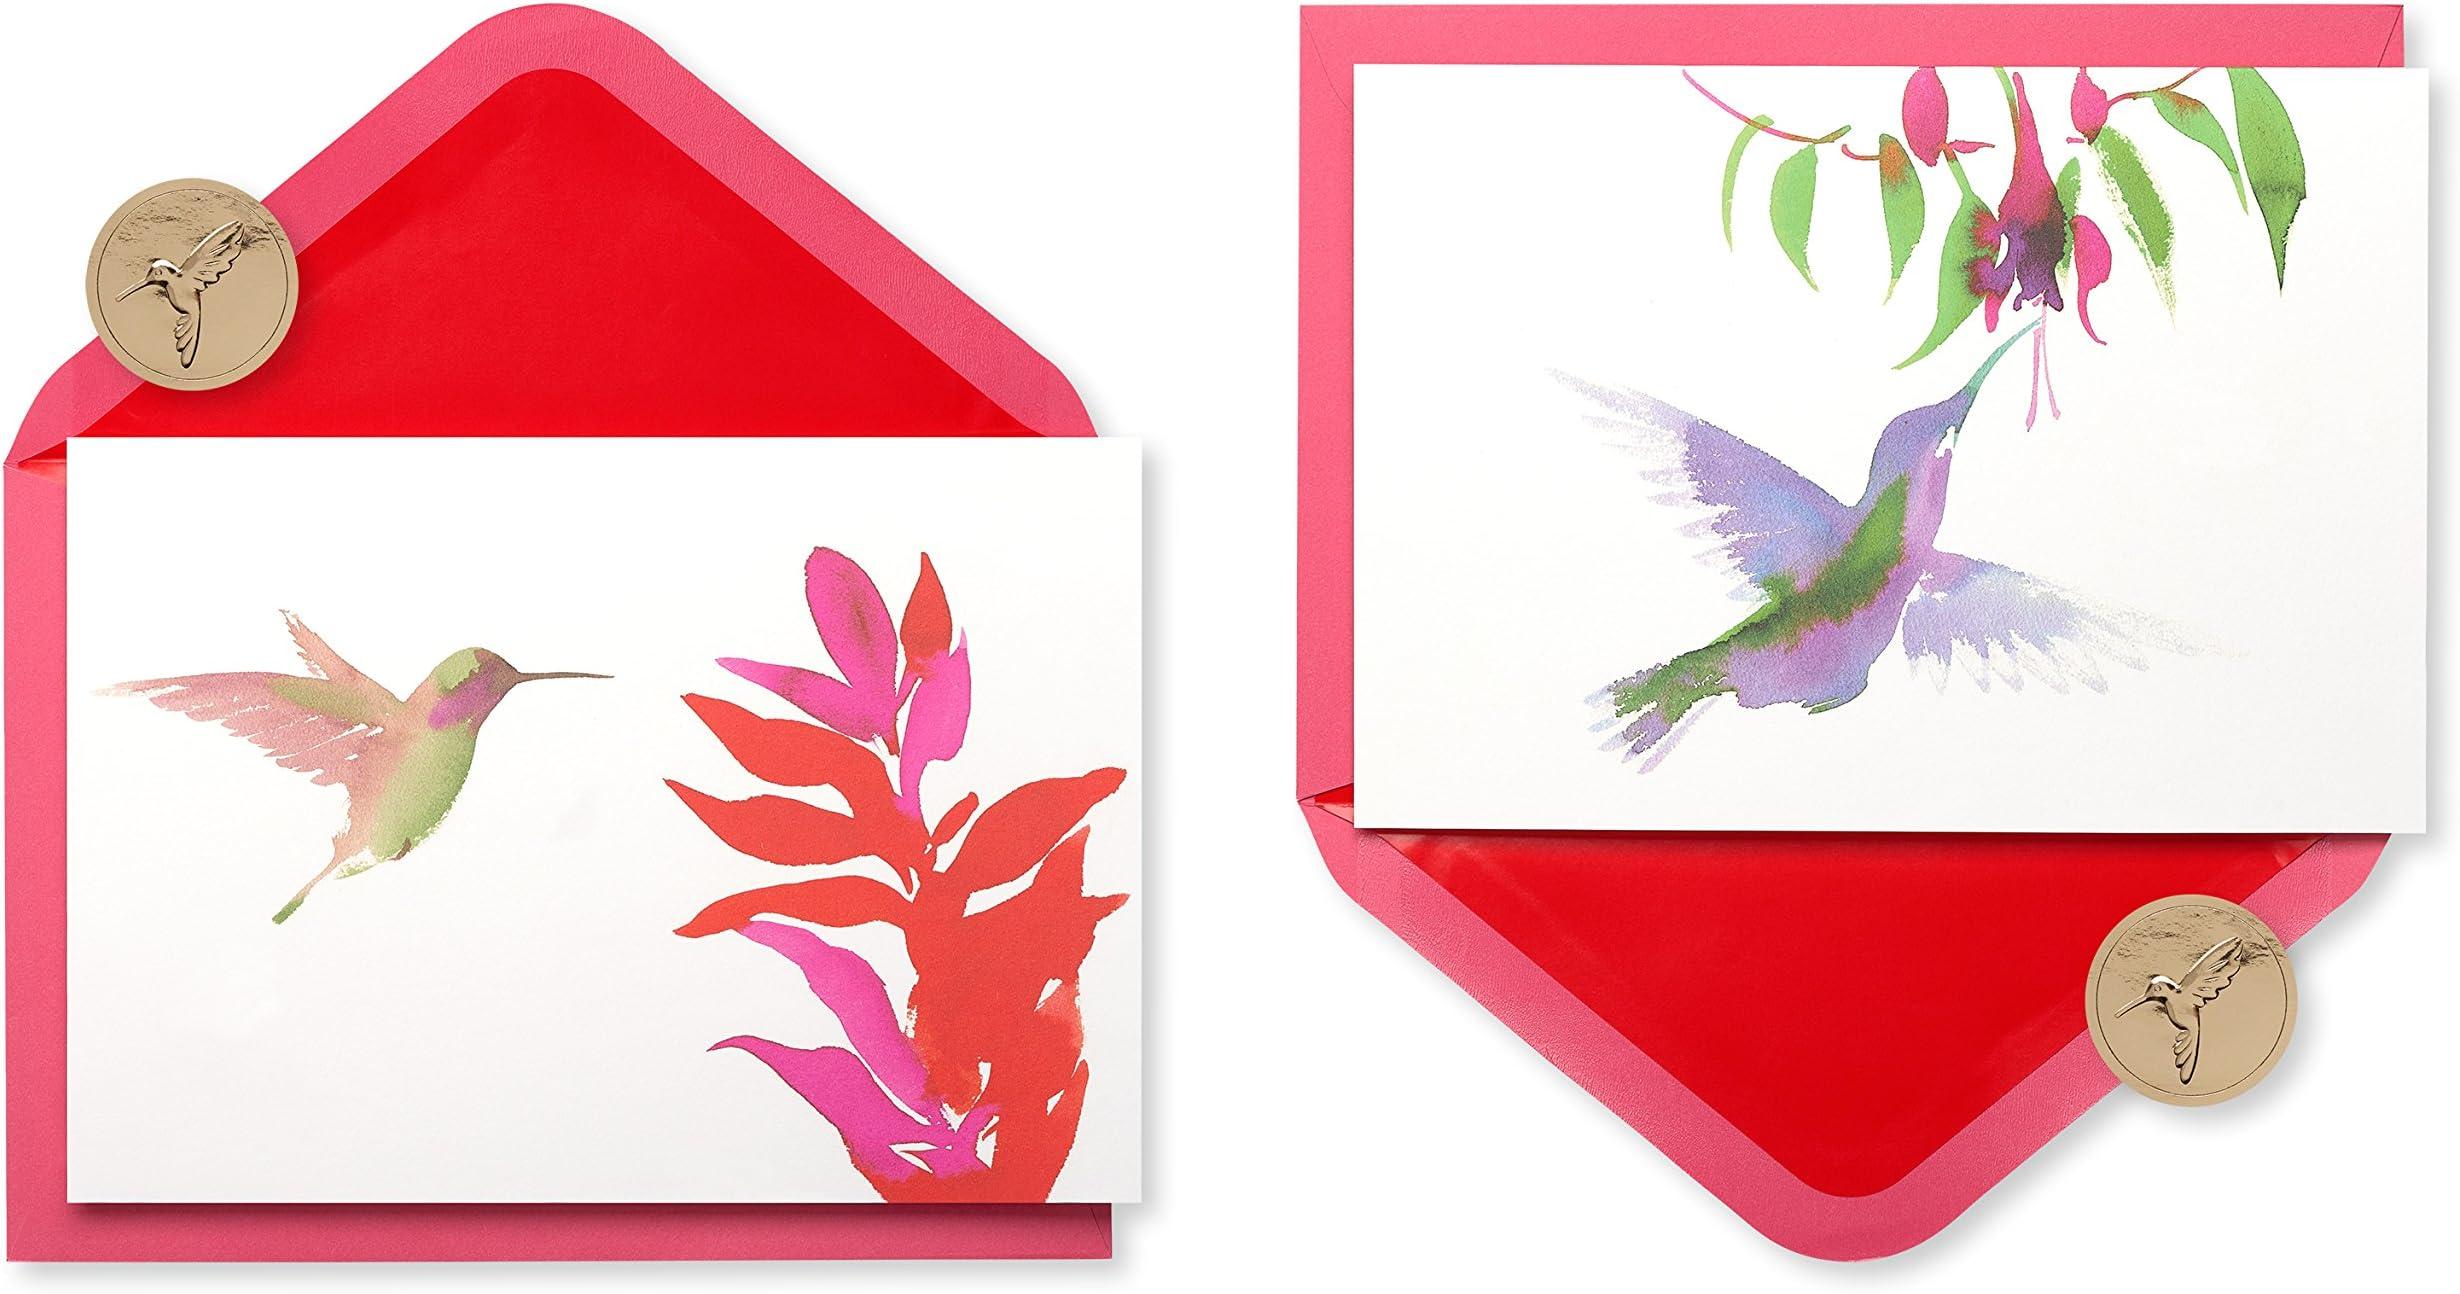 5 Hummingbird Cards Watercolor Birds Bright Hummingbird 5 Bird Note Cards 5 Blank Artist Cards Hummer Art Card 5 Bird Card Pack